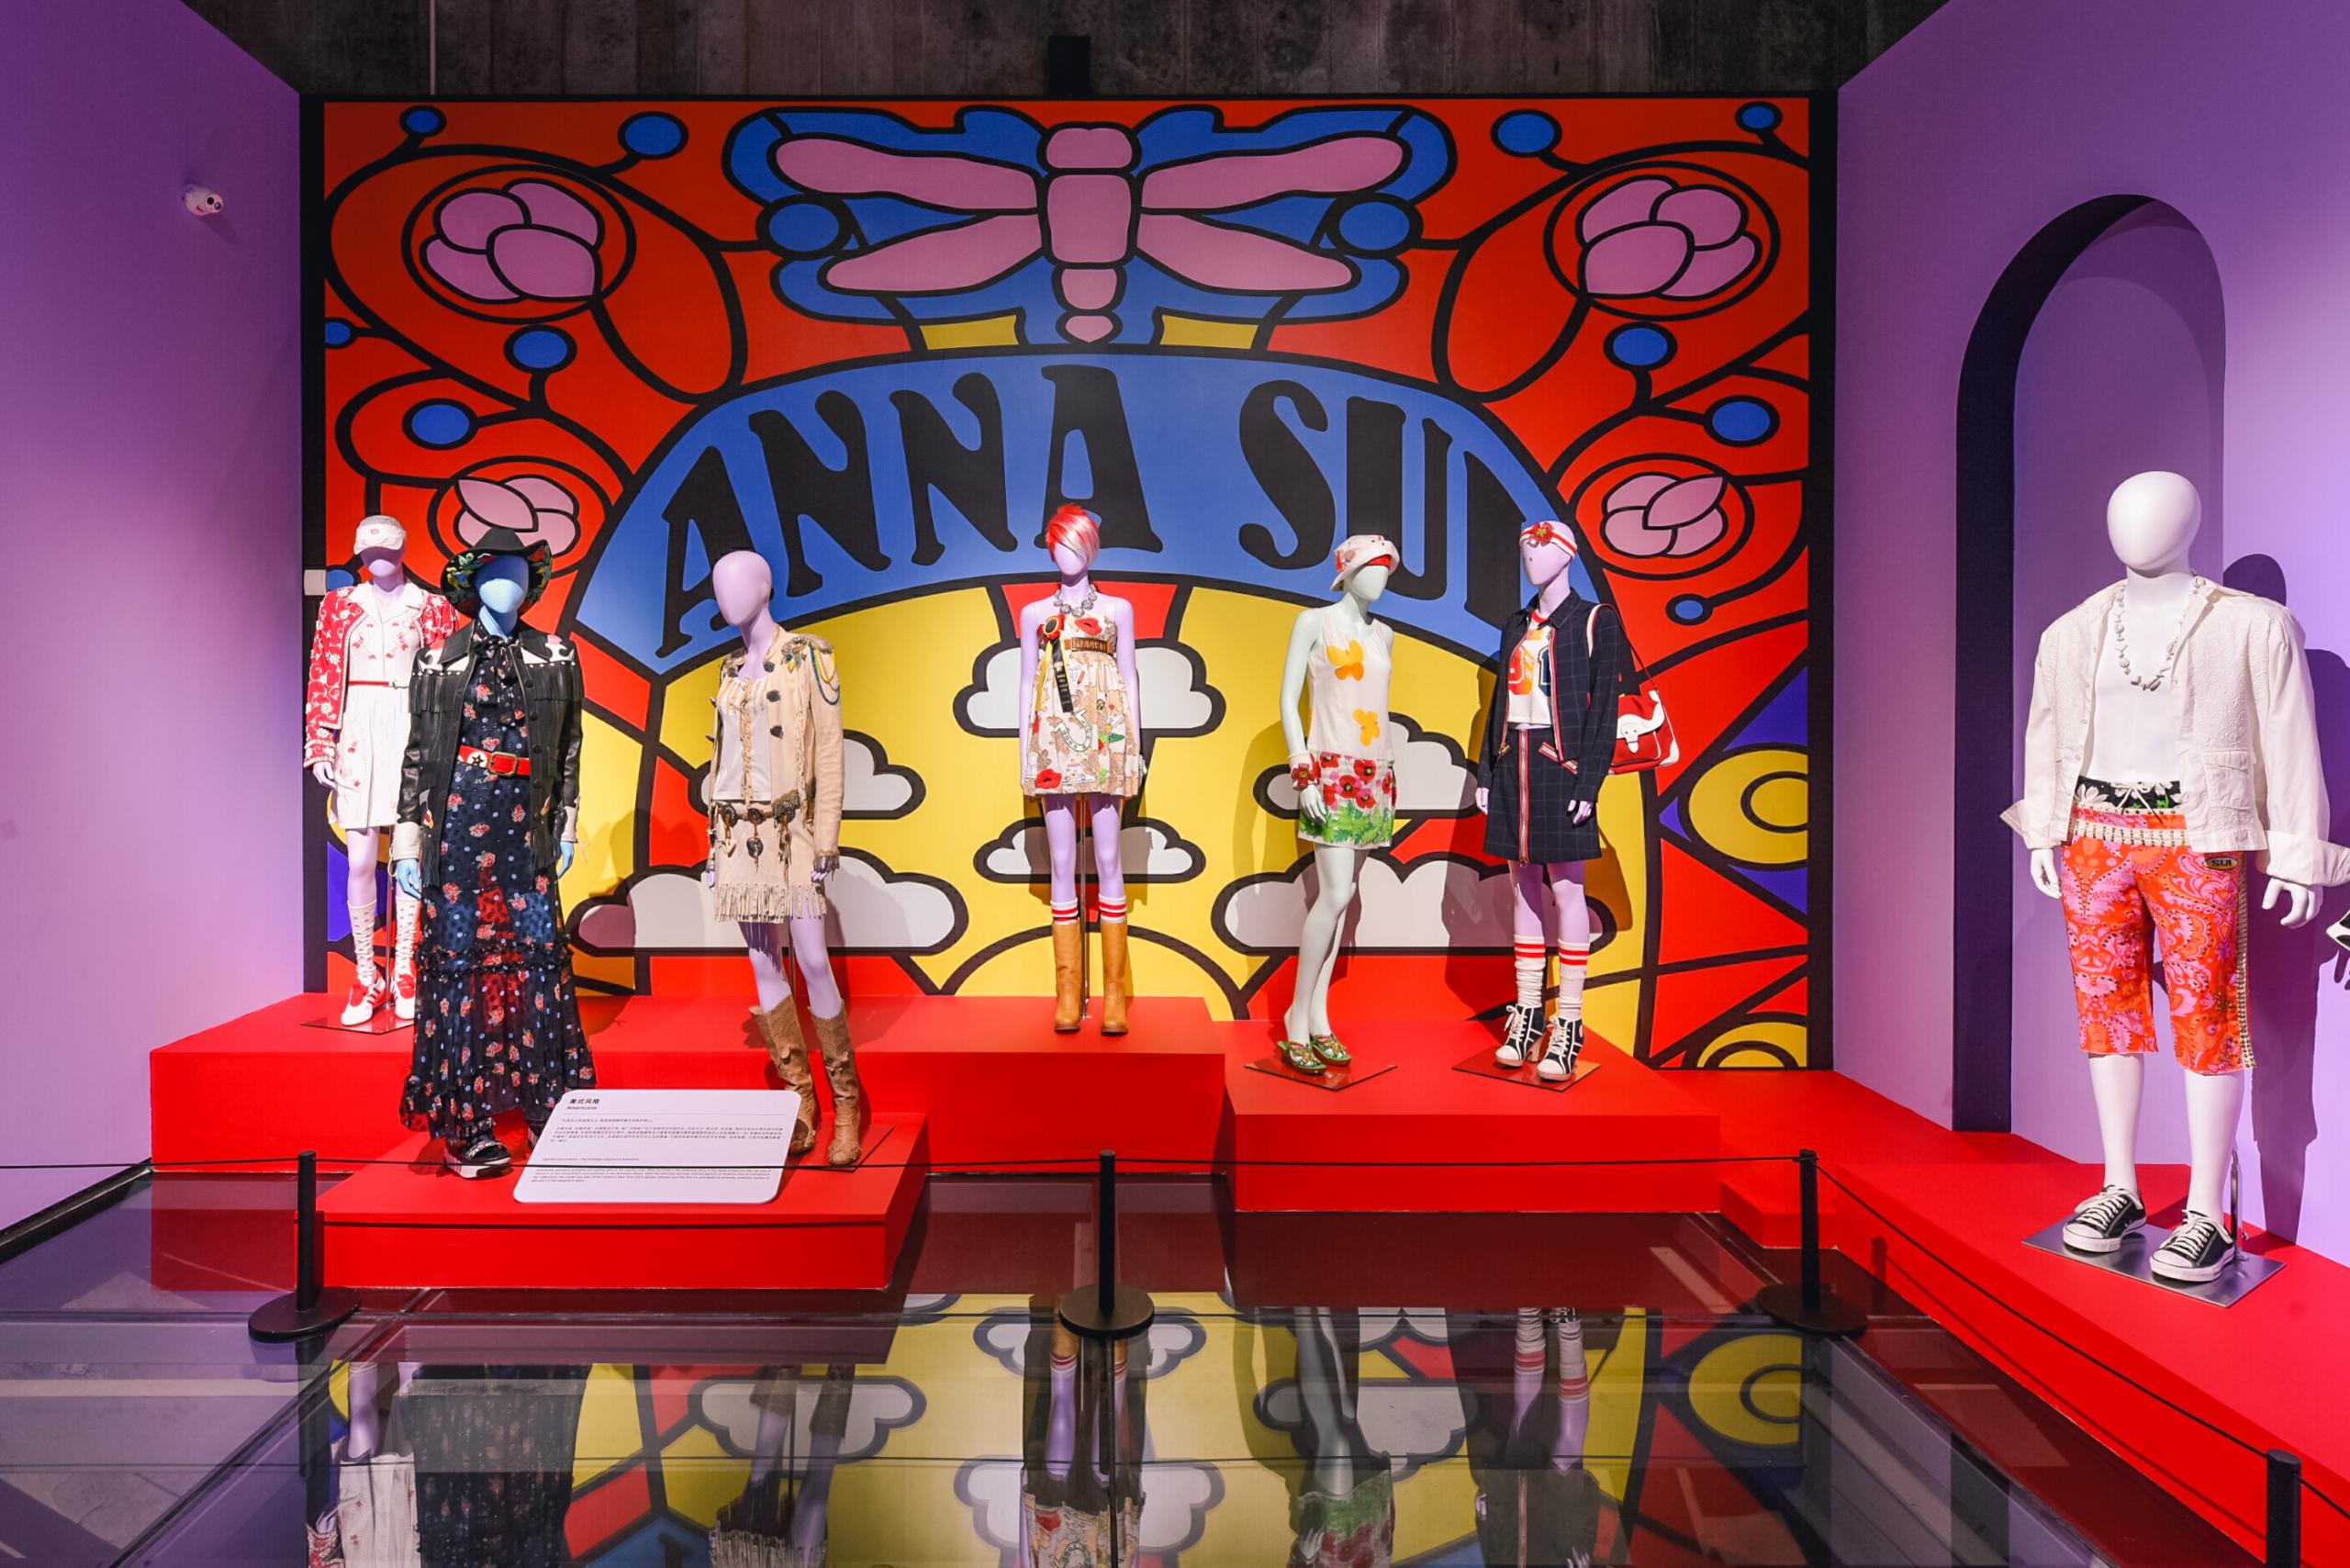 Anna Sui Installation Image